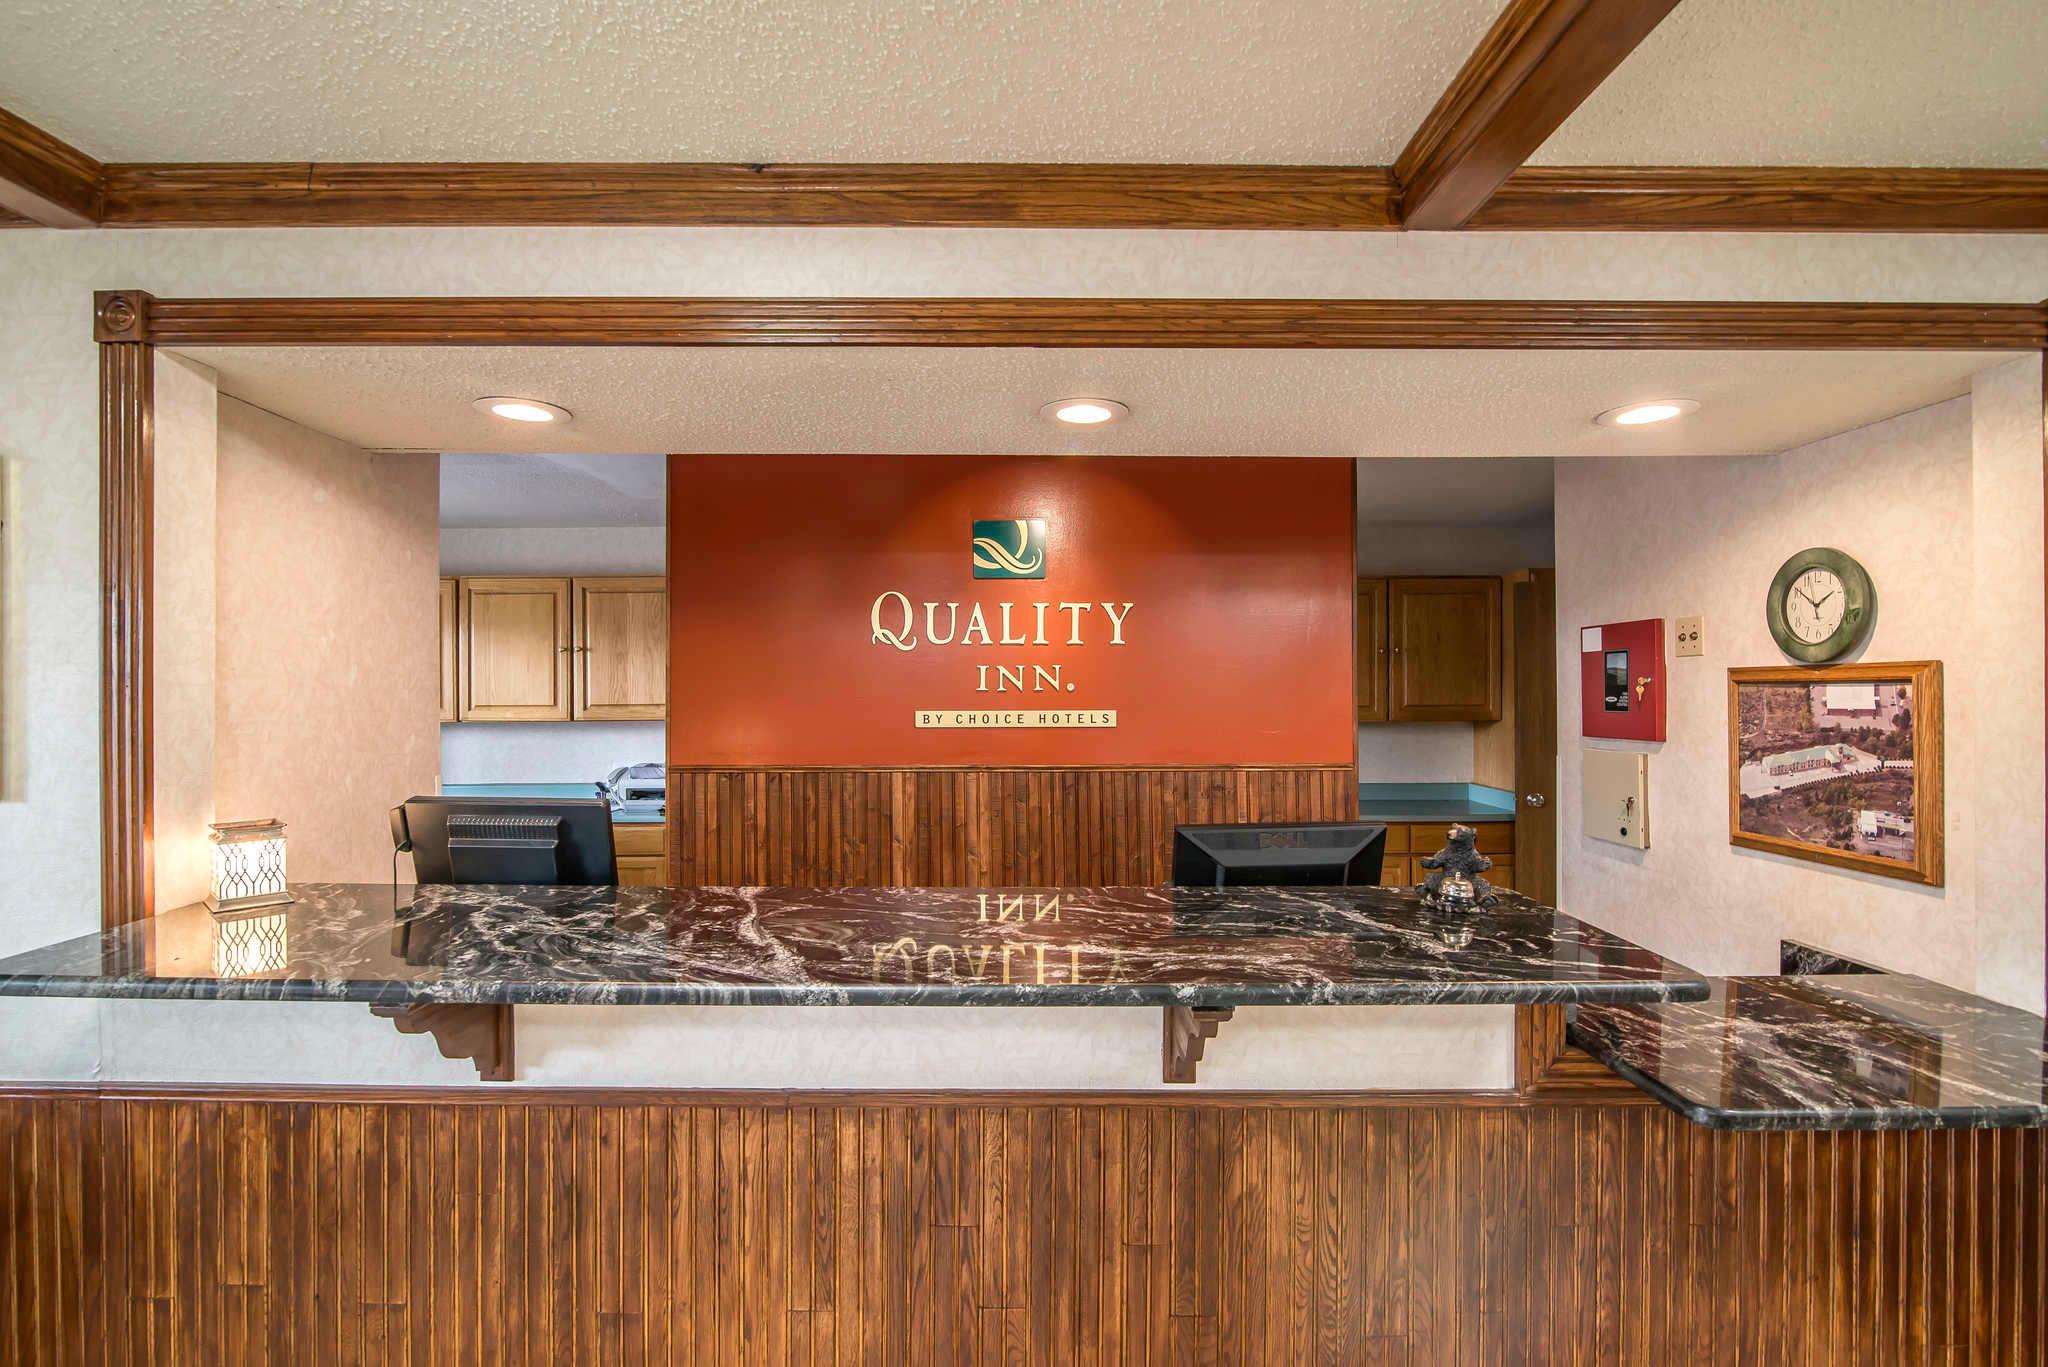 Phil Long Ford Raton >> Quality Inn, Raton New Mexico (NM) - LocalDatabase.com